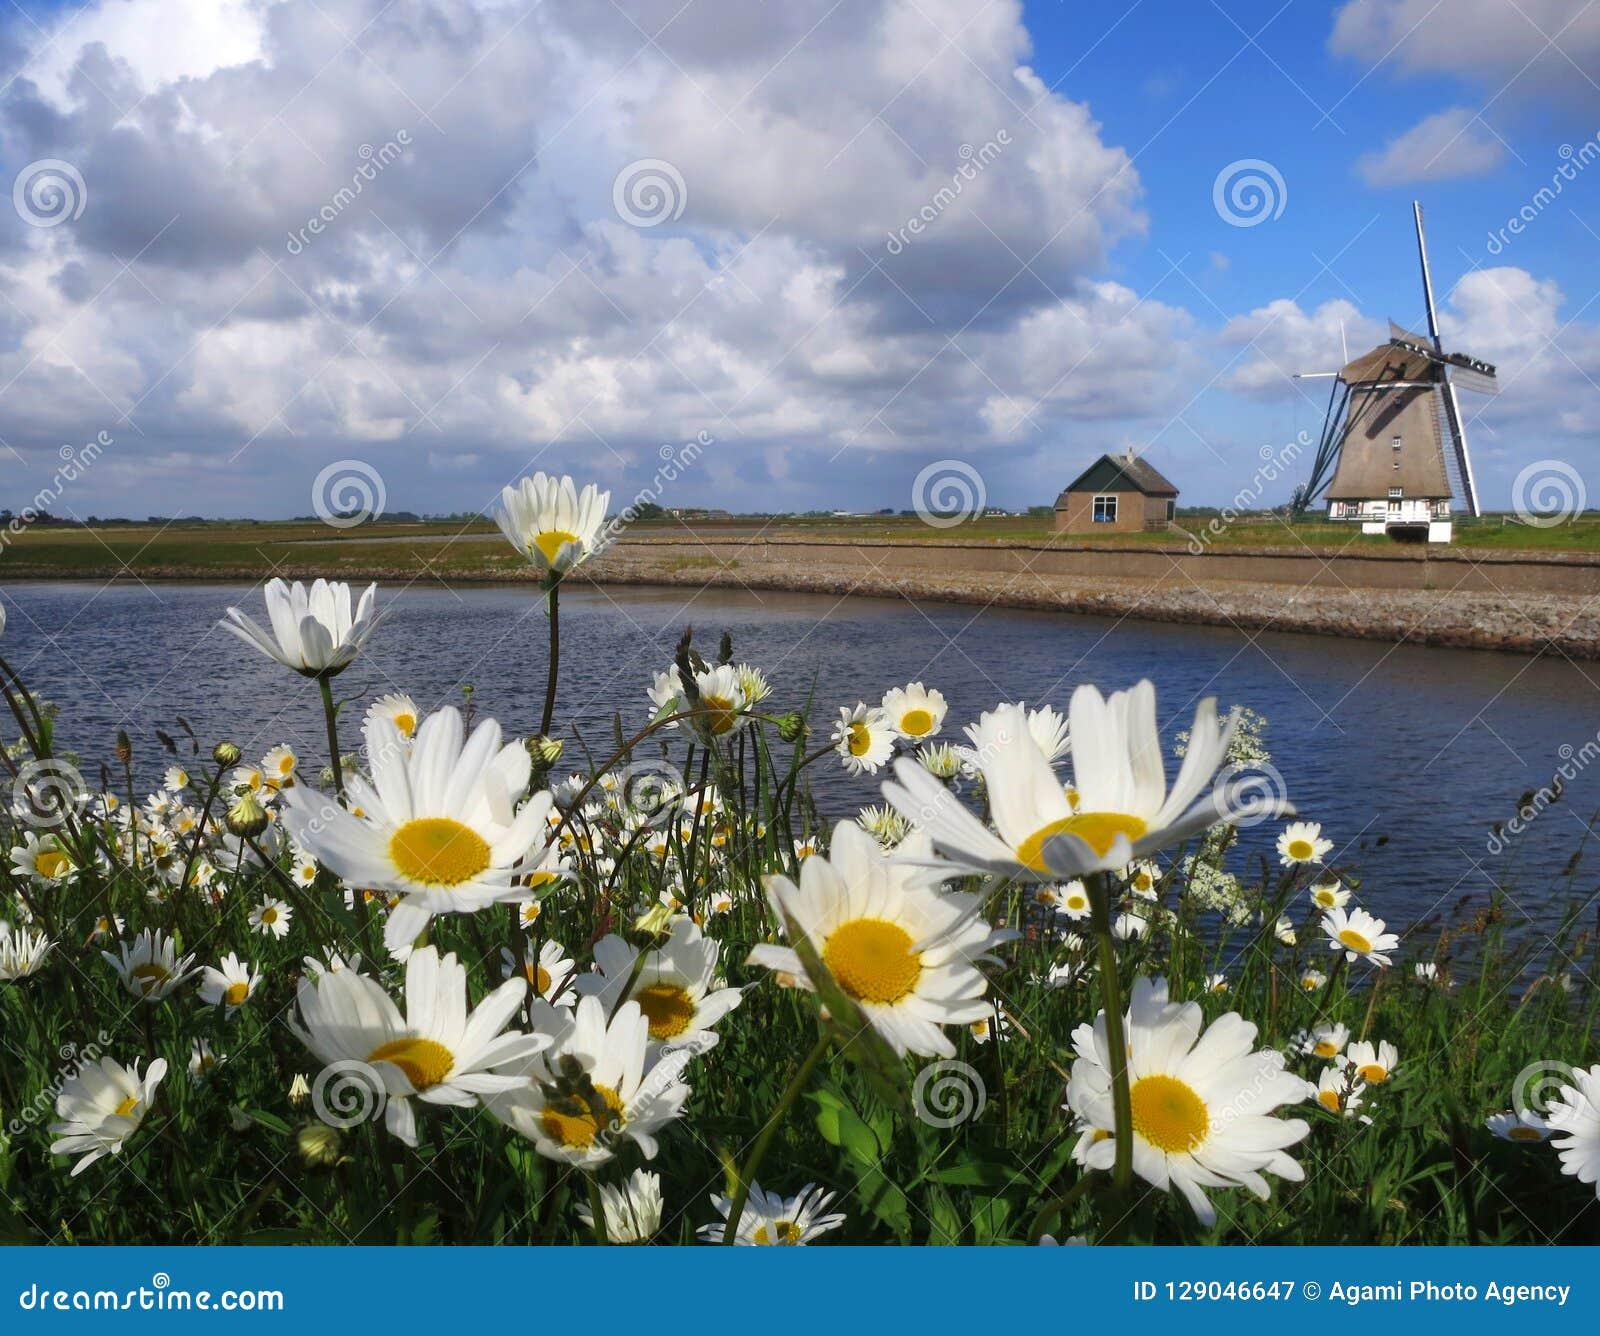 Madeliefjes op Texel  Η αγγλική Daisy σε Texel, Κάτω Χώρες